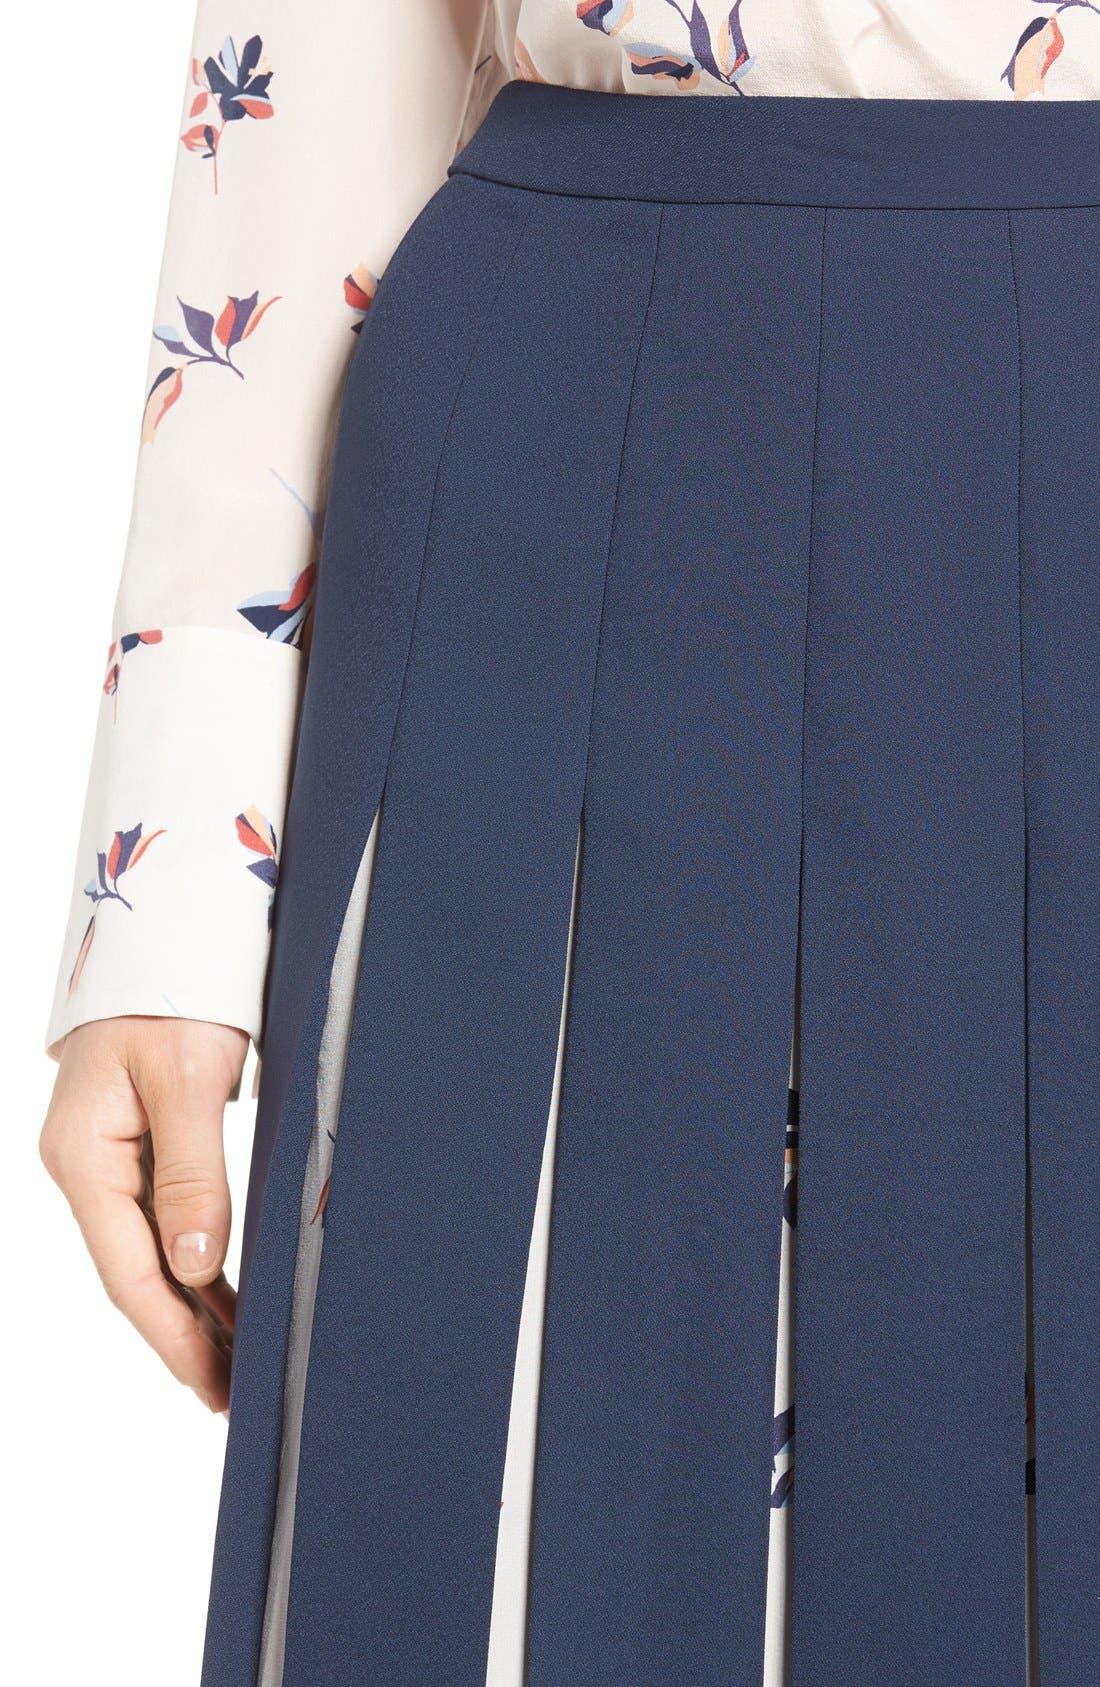 Print Mix Pleated Skirt,                             Alternate thumbnail 7, color,                             410